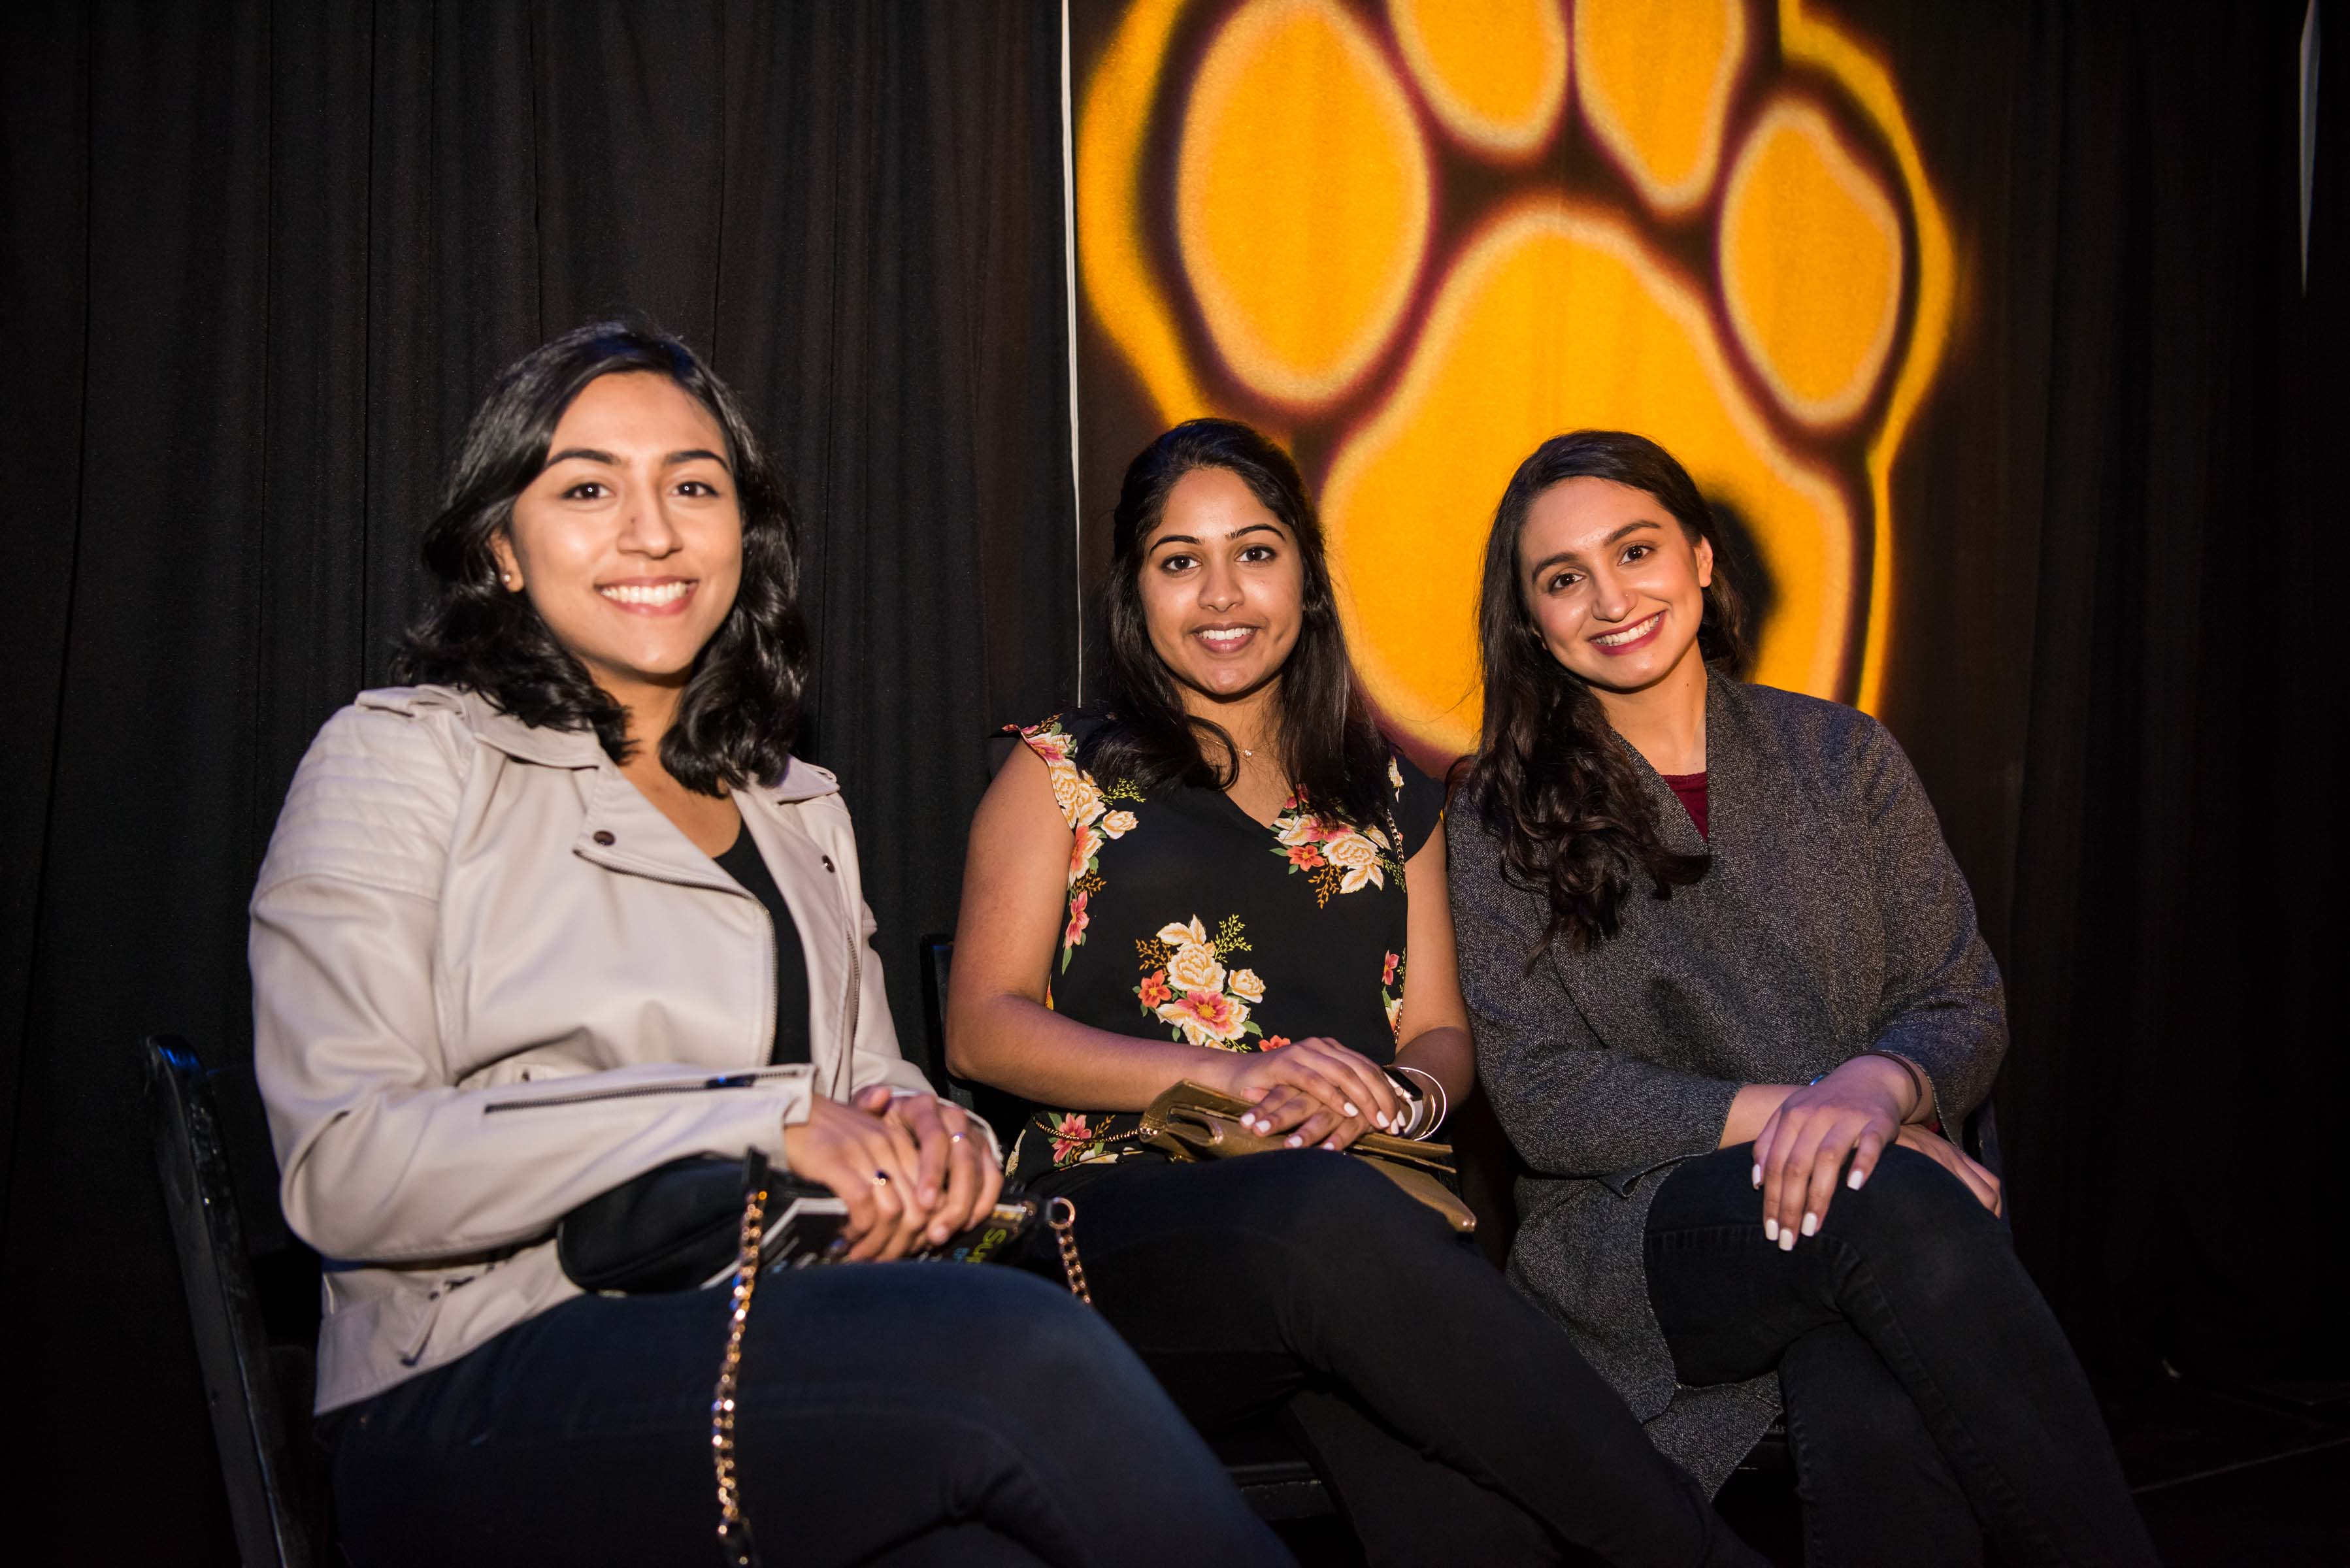 Three women sit umbc paw illuminated on curtains behind them